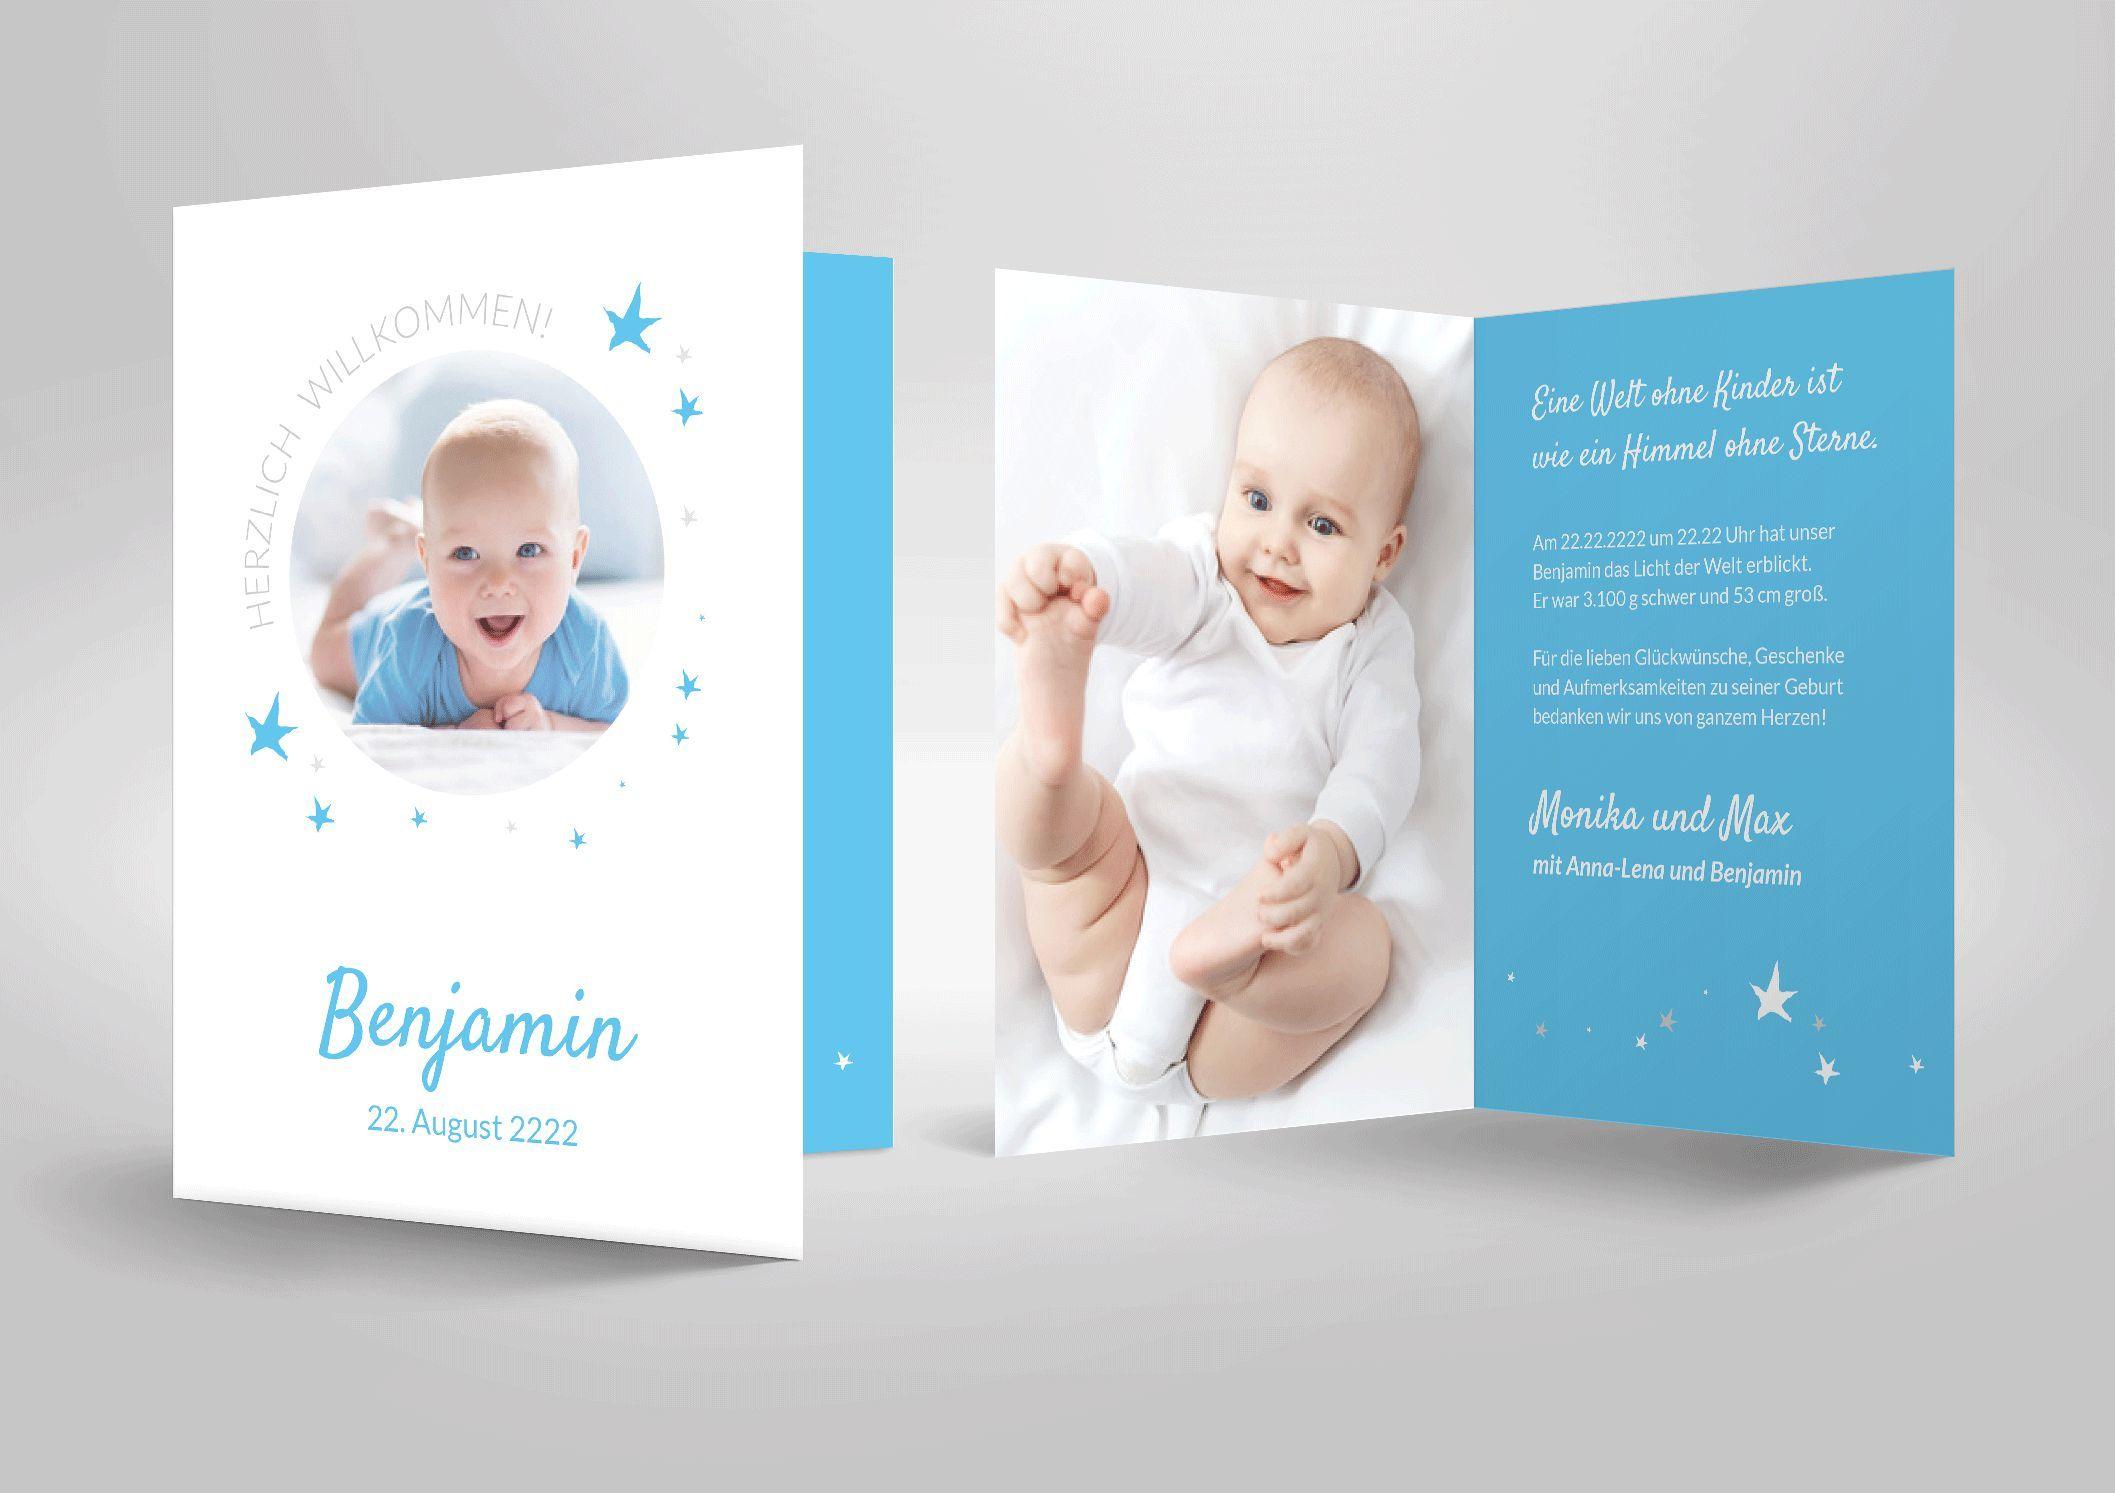 Geburt Dankeskarten Geburt Dankeskarten Spruch Danksagung